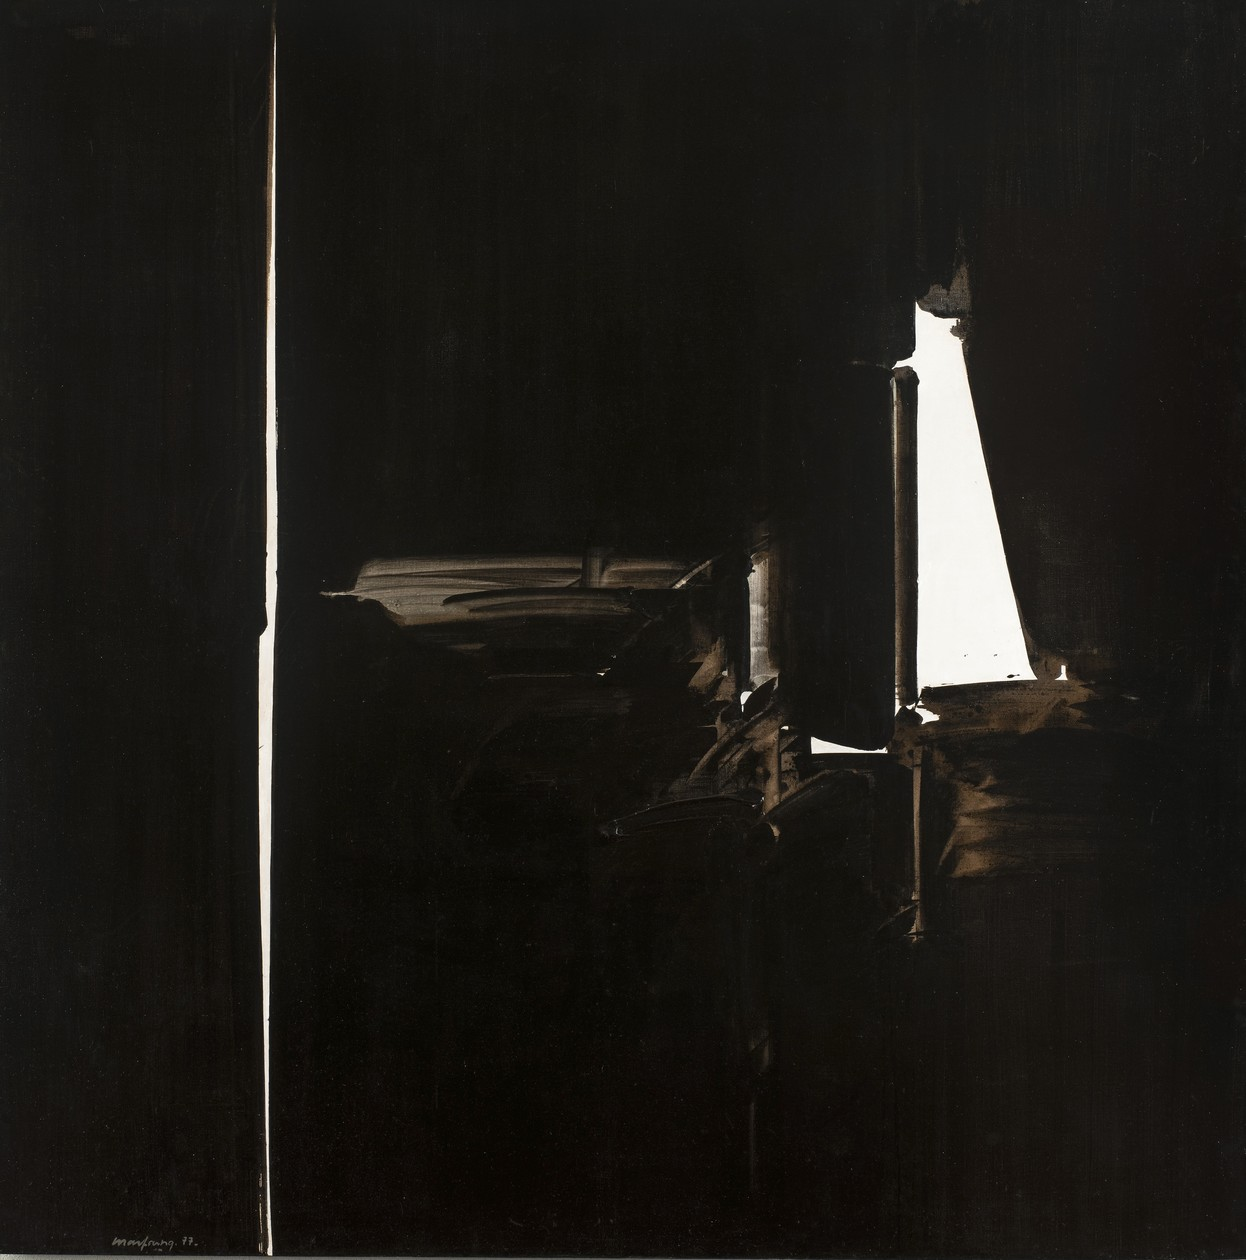 Exposition-André-Marfaing,-Peintures